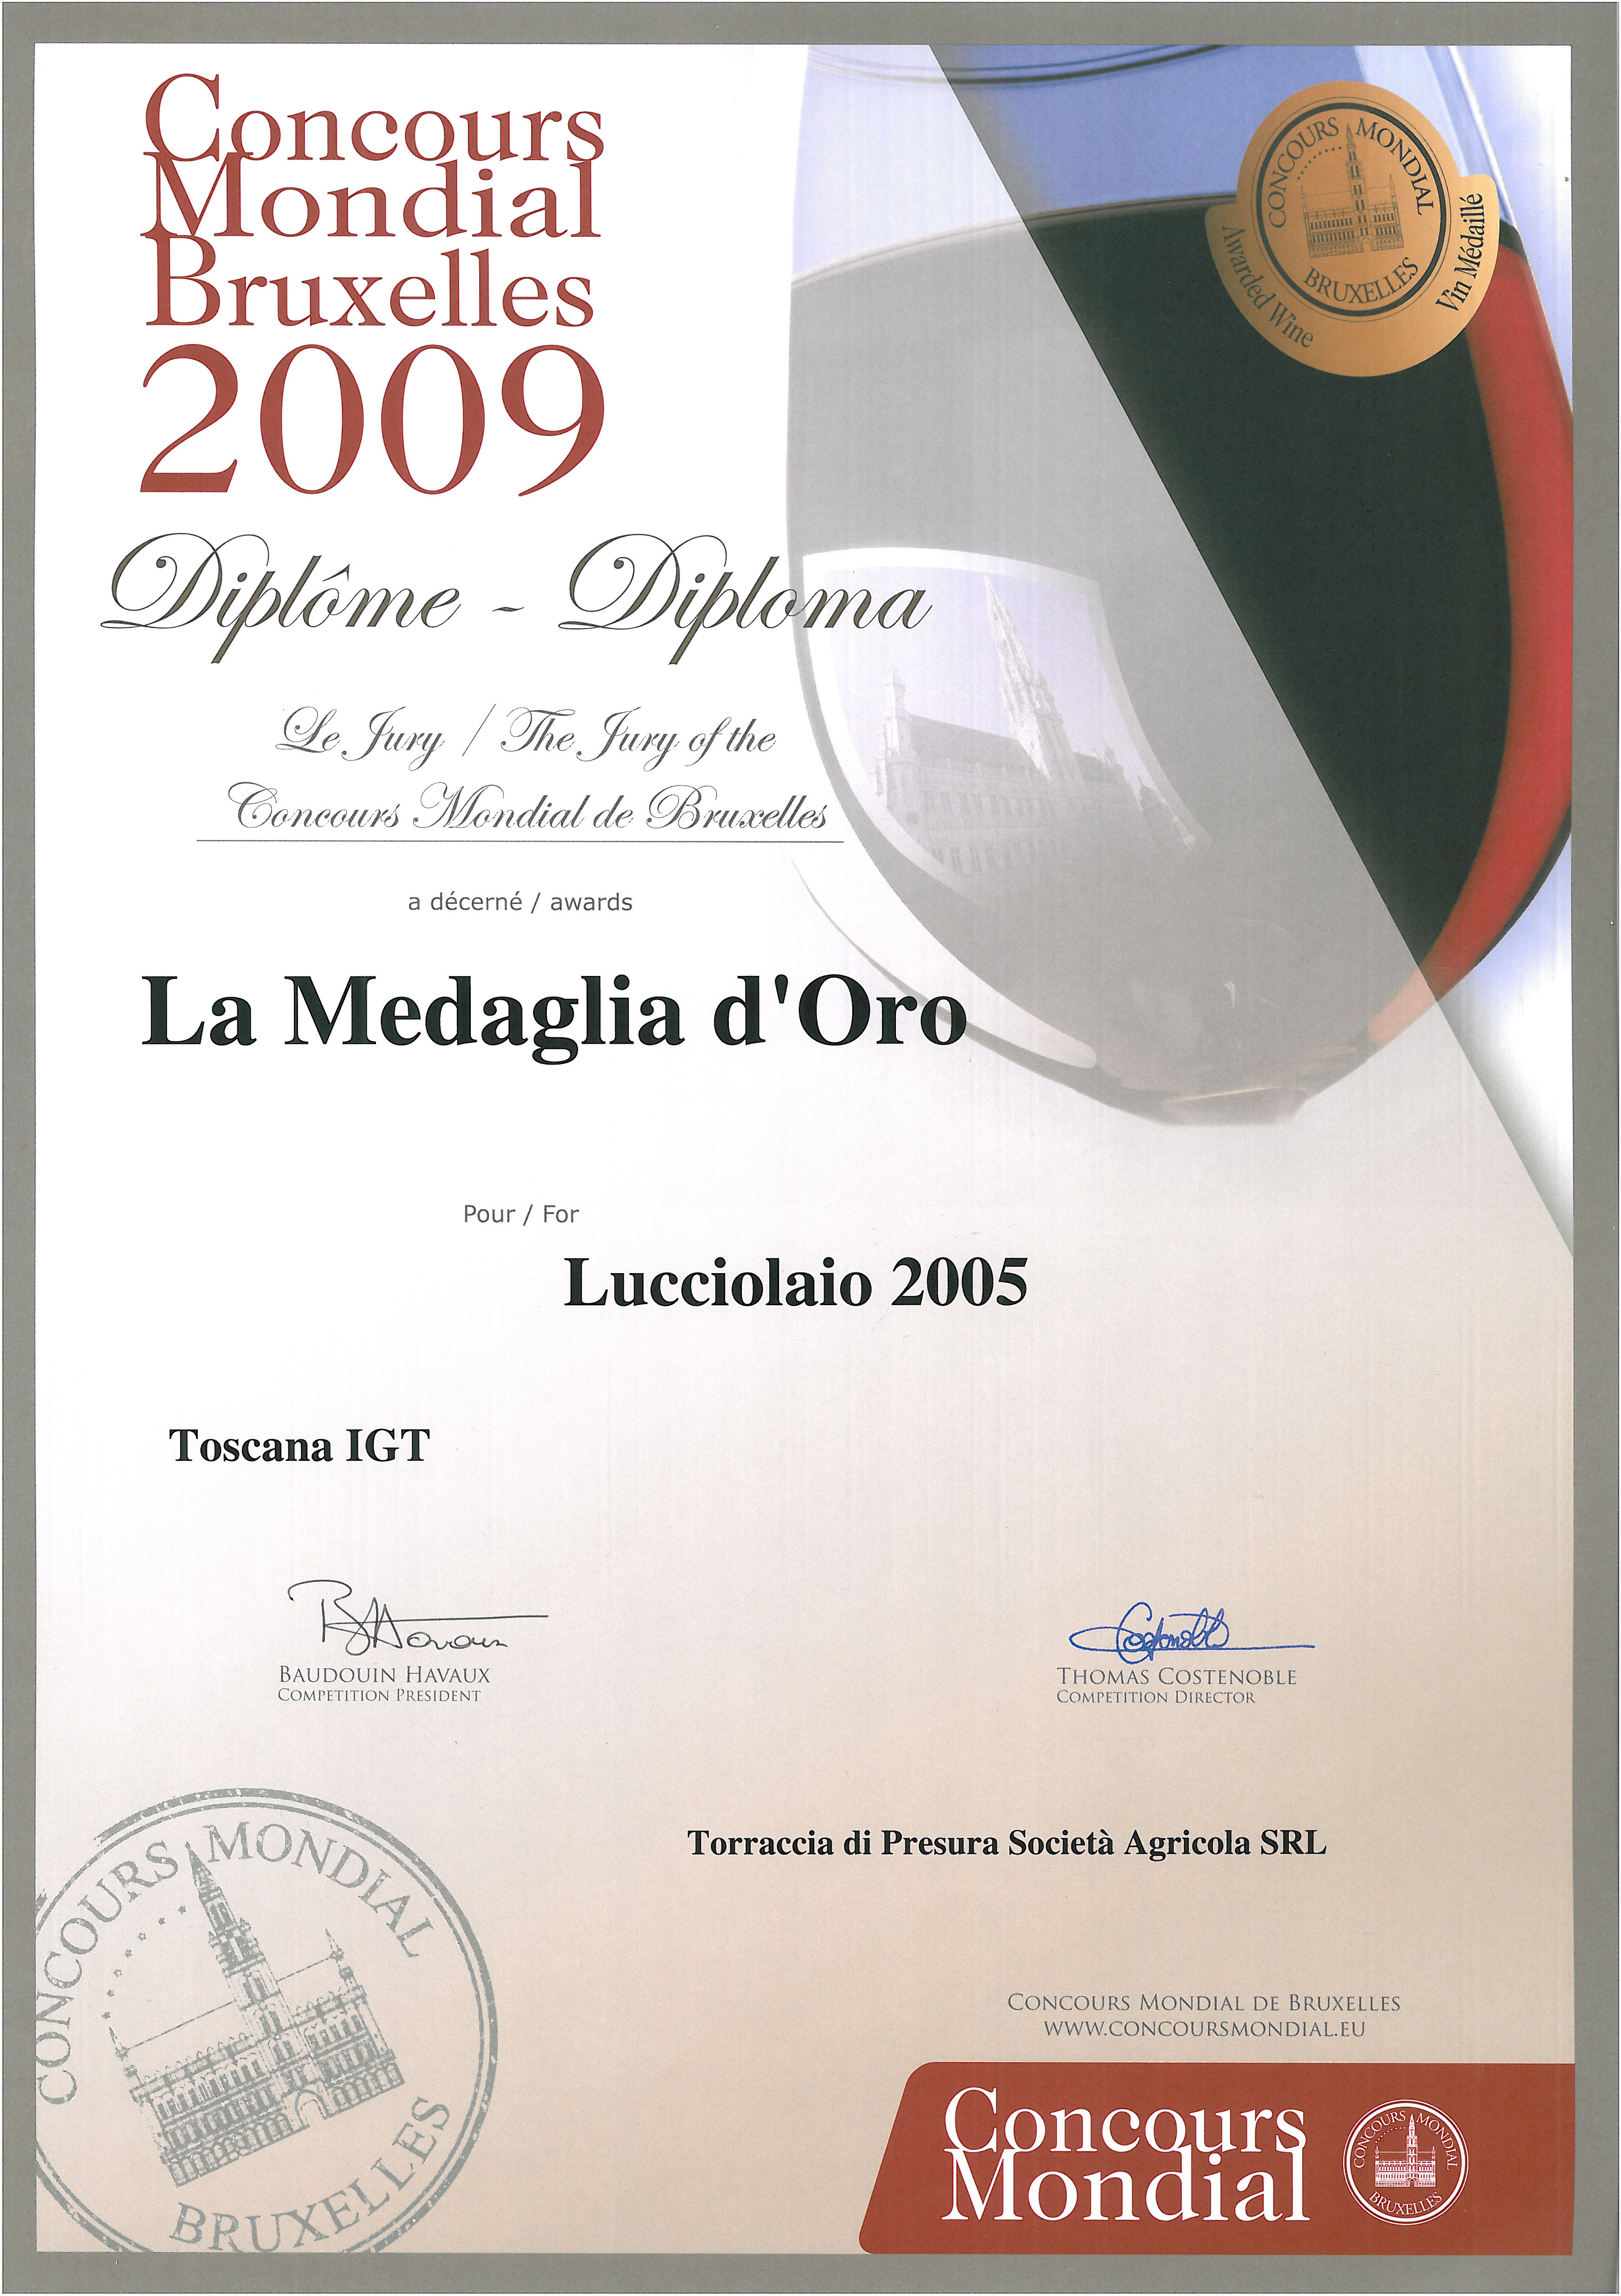 65 LUC 2005 Bruxelles 2009 2009